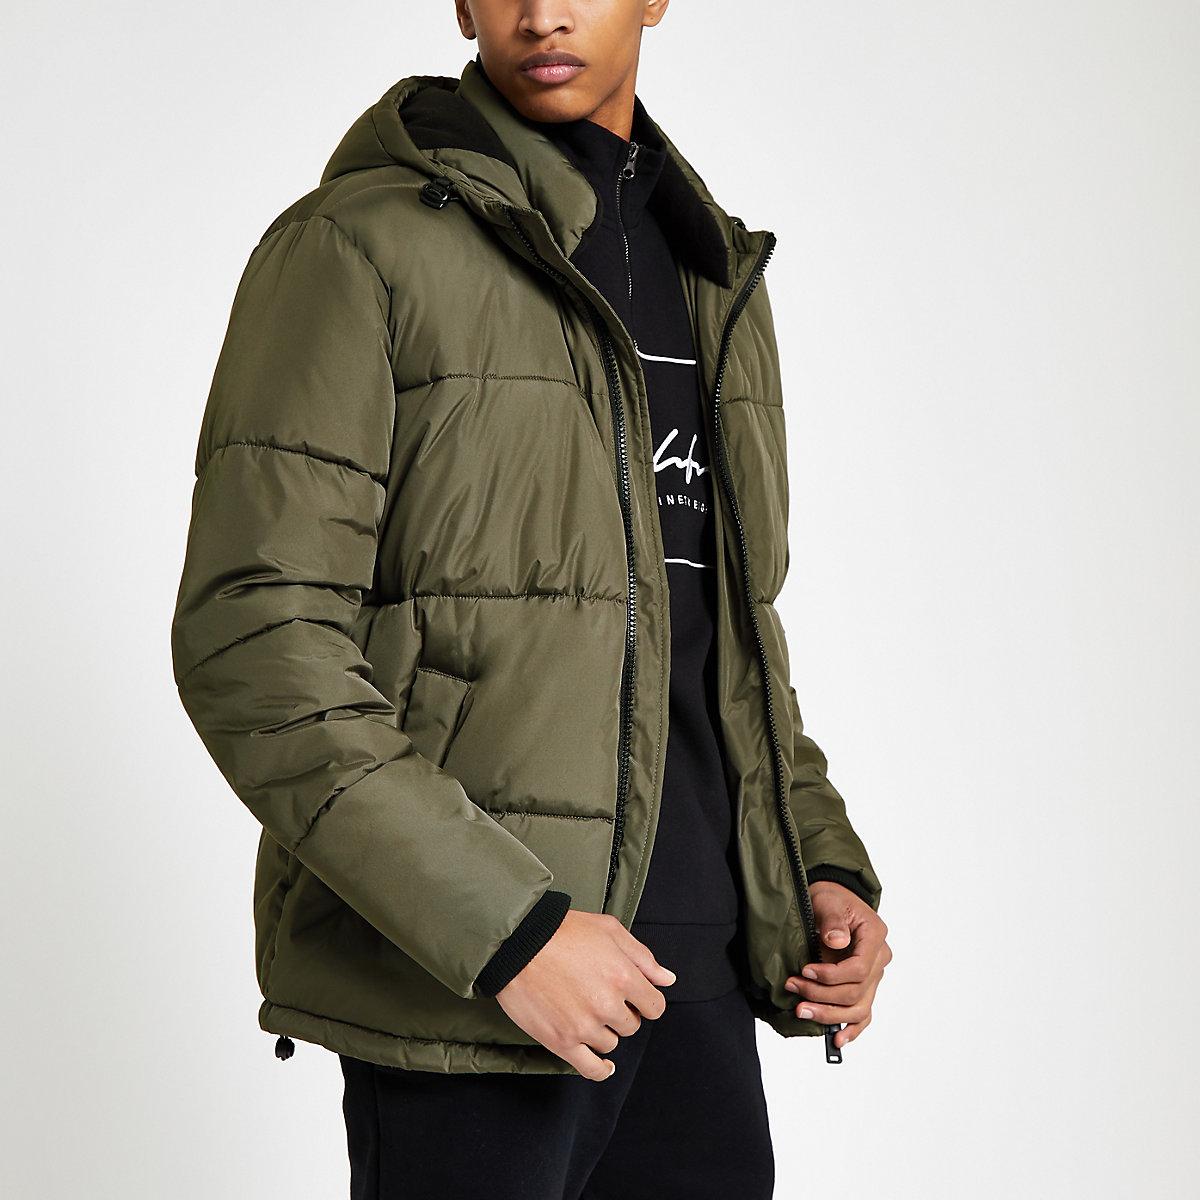 Khaki 'Prolific' hooded puffer jacket